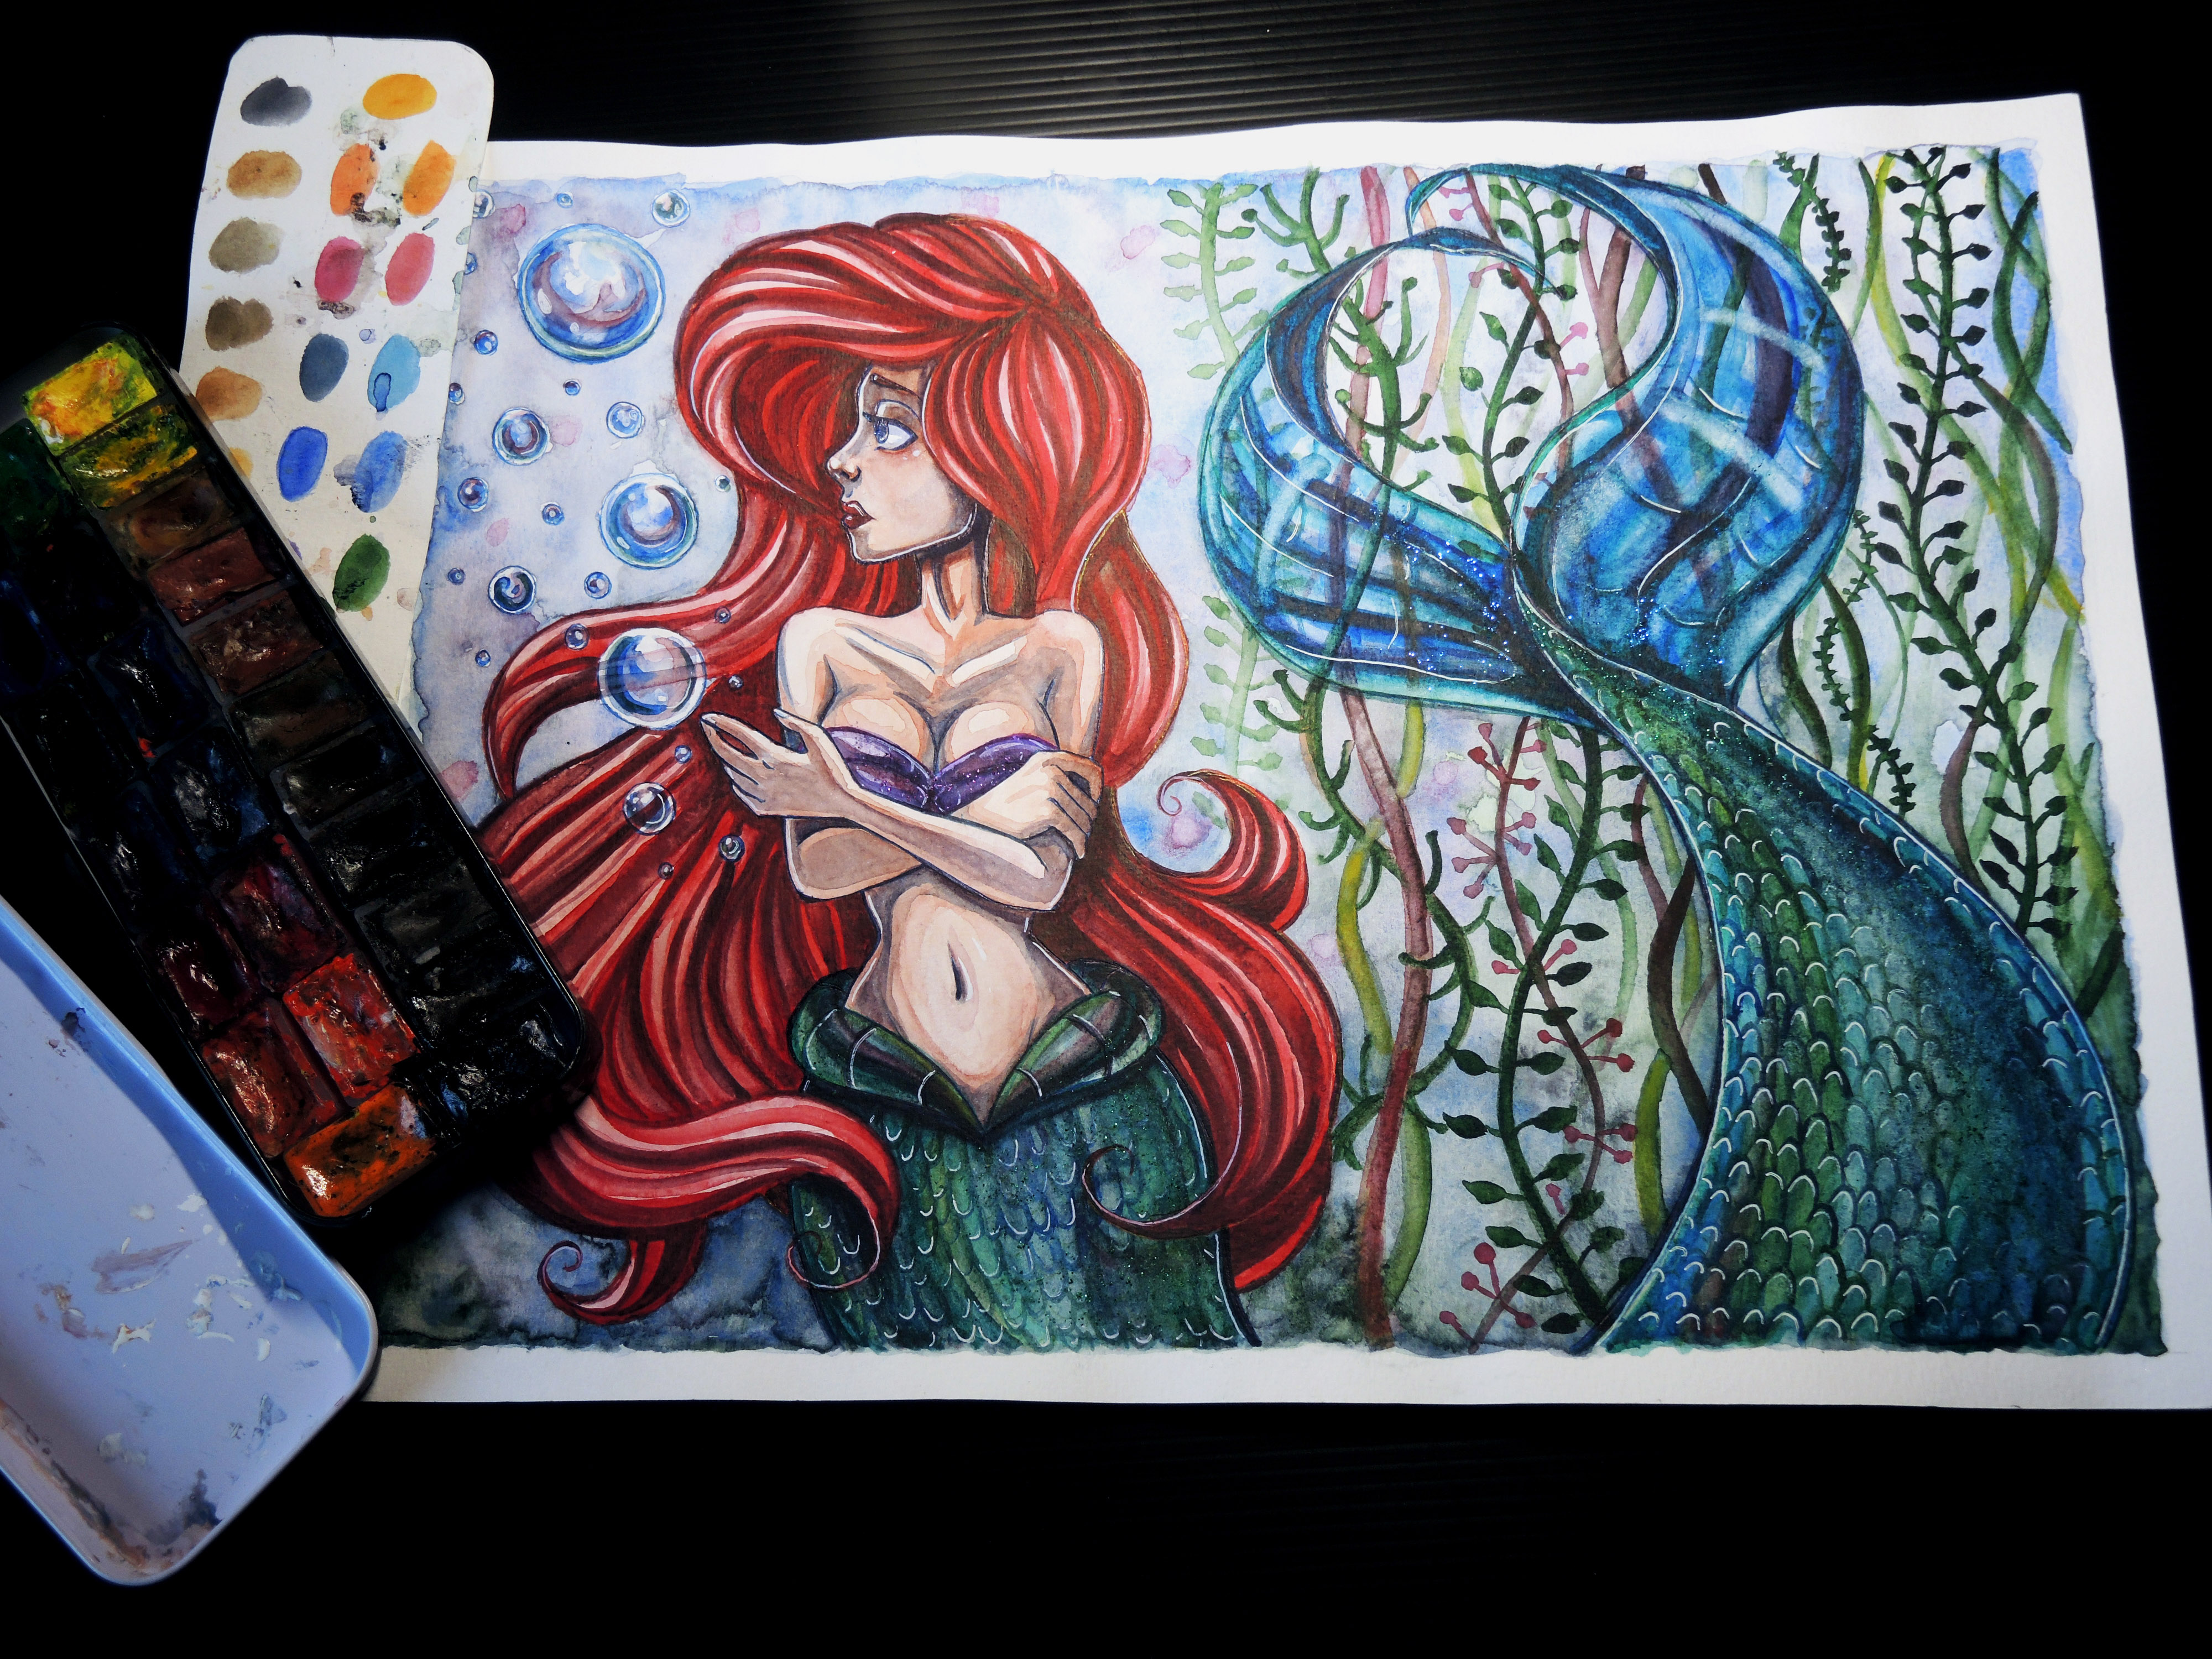 4000x3000 Ariel Watercolor Painting (Original) On Storenvy